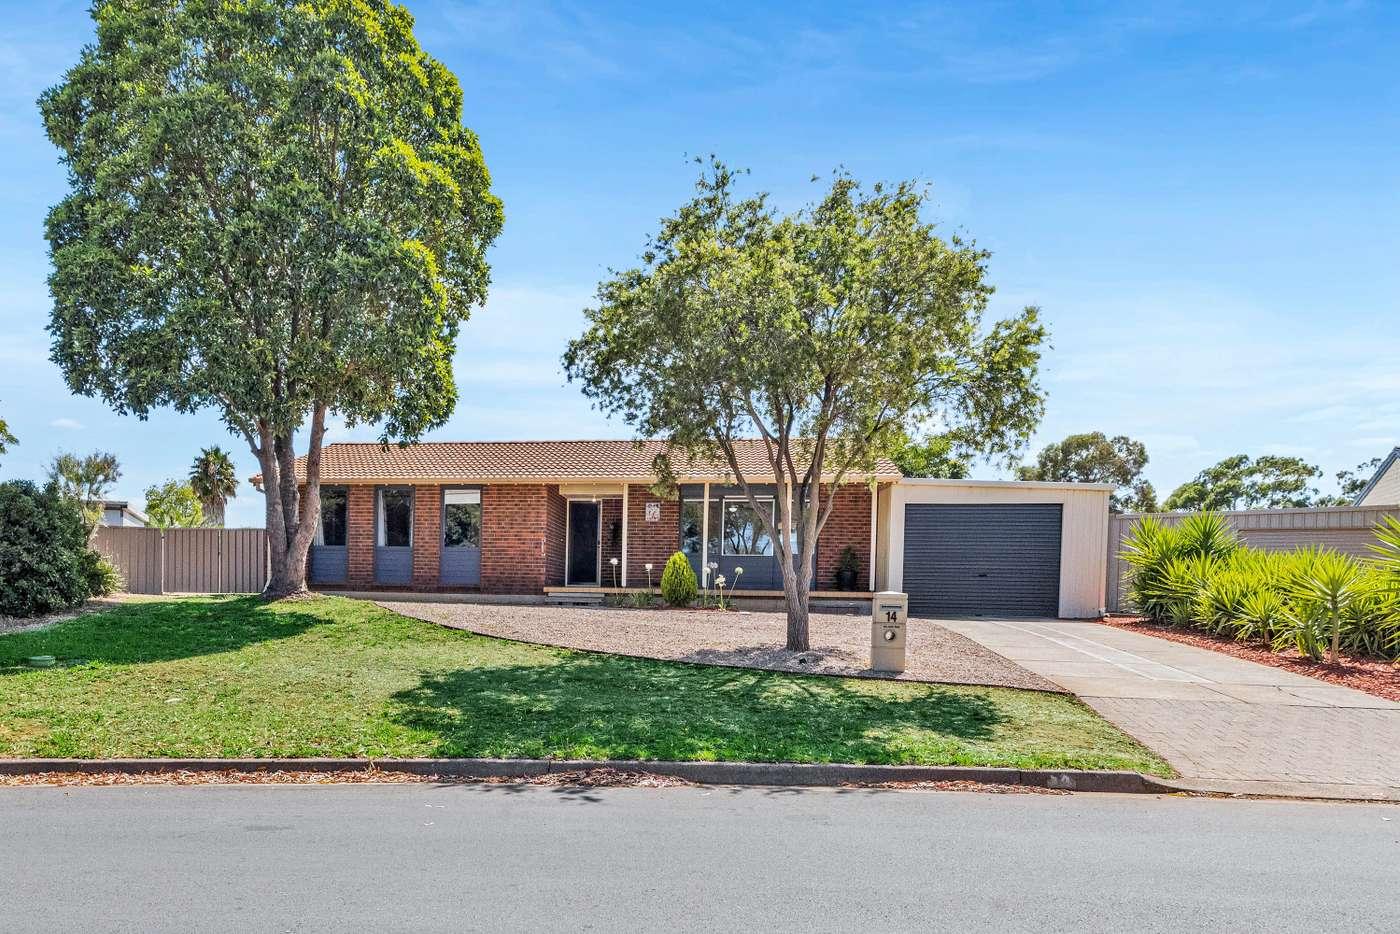 Sixth view of Homely house listing, 14 Lindsay Drive, Morphett Vale SA 5162